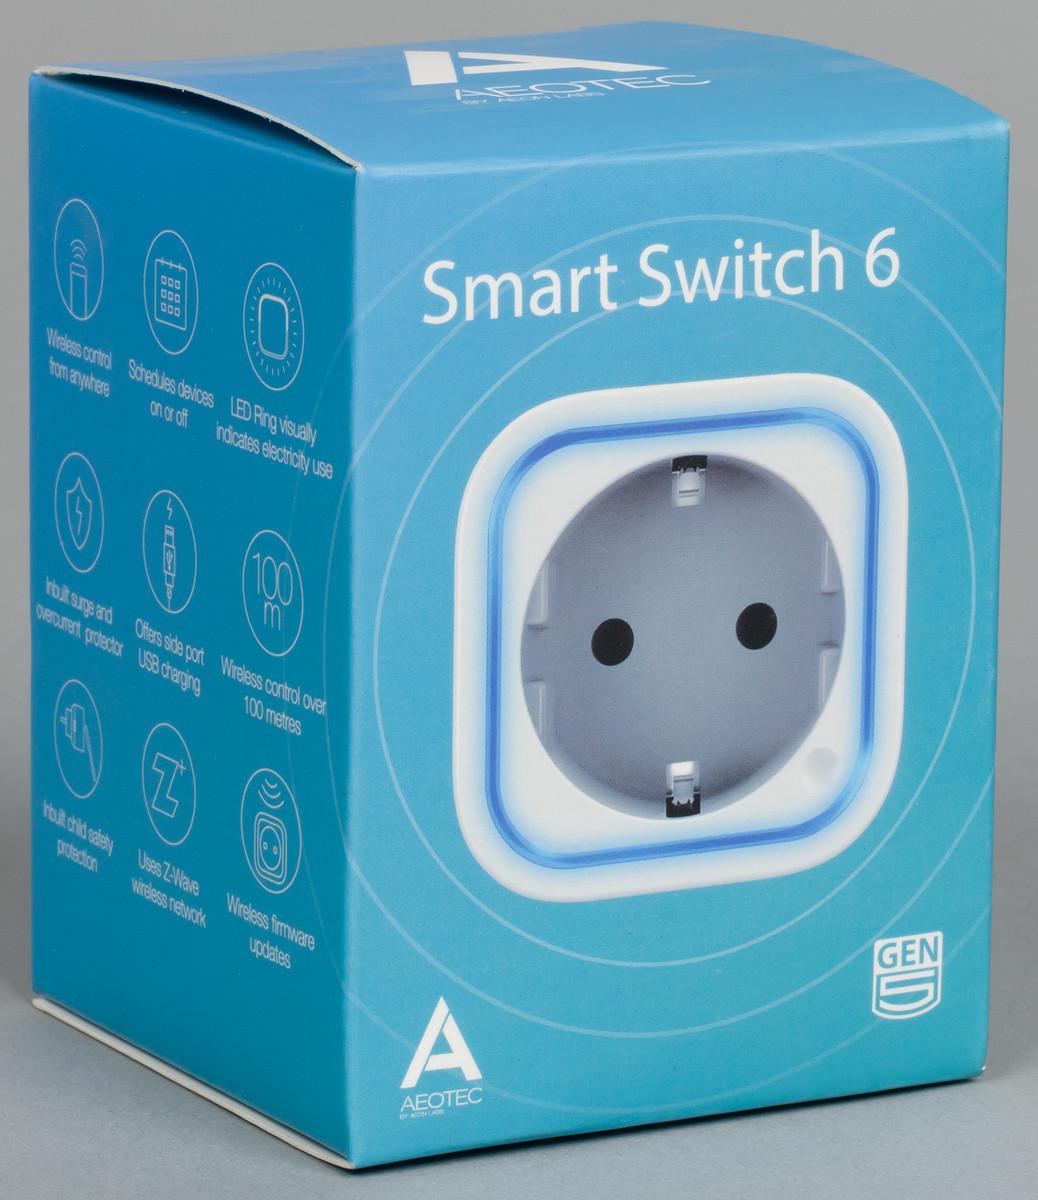 ZW096 розетка Aeotec Smart Switch 6, Z-Wave, AC 230V 13A + USB 5V 1A